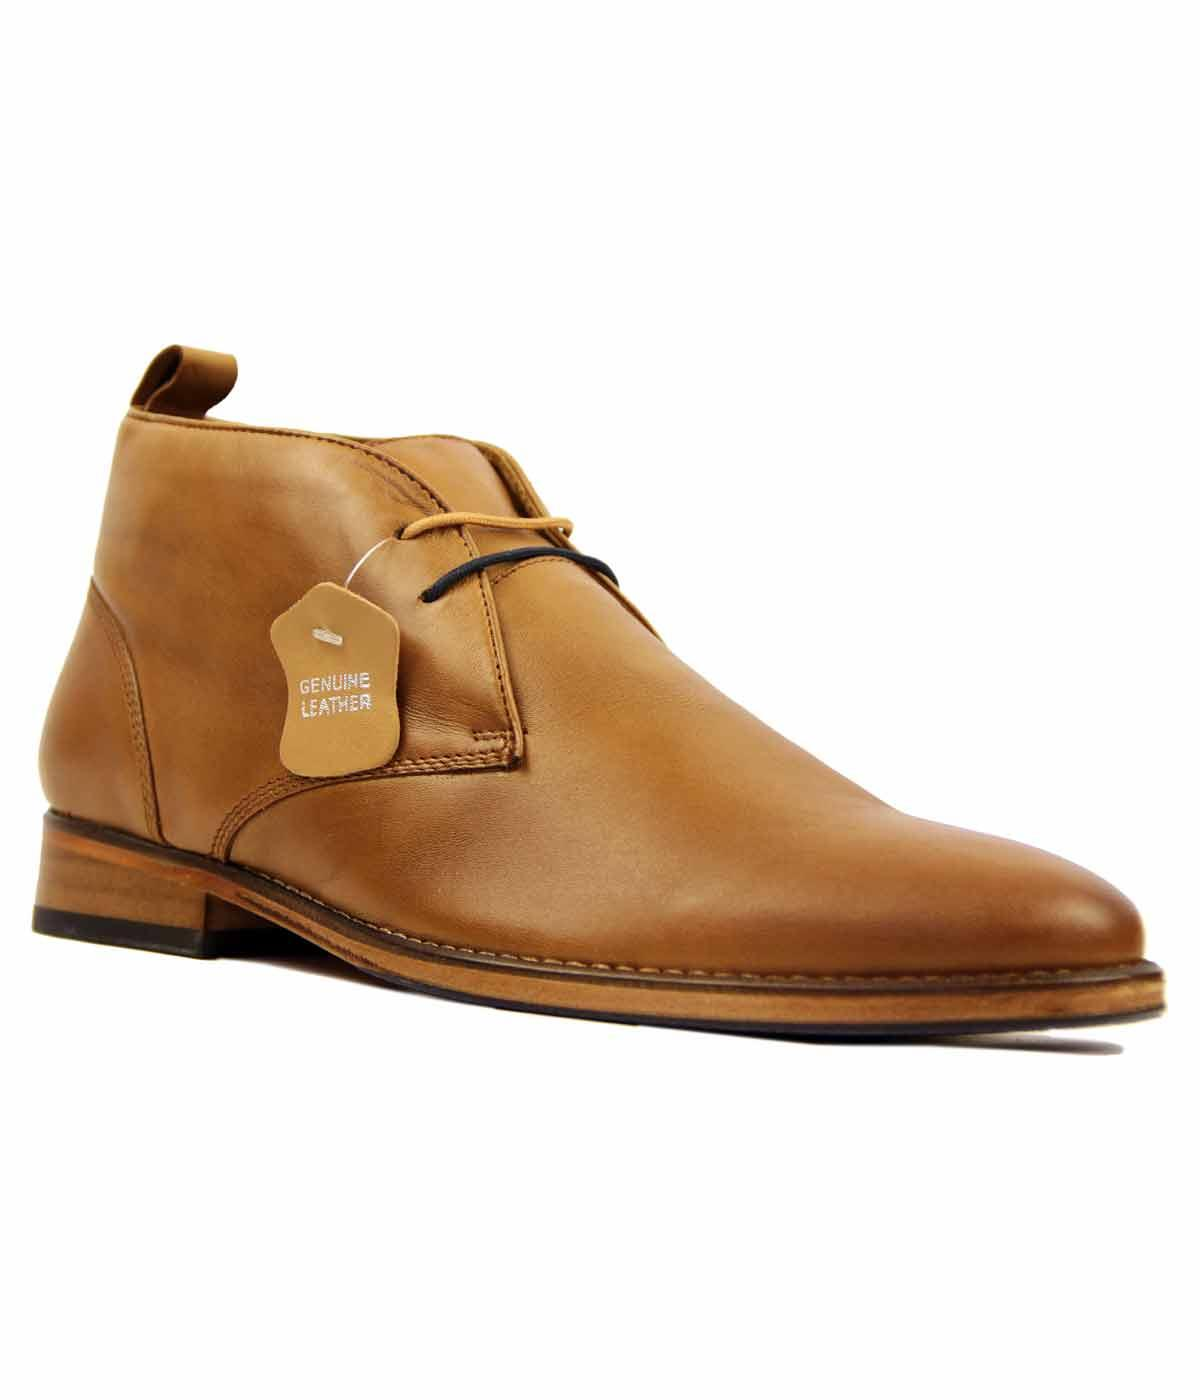 Kingston Leather PAOLO VANDINI Mod Desert Boots T